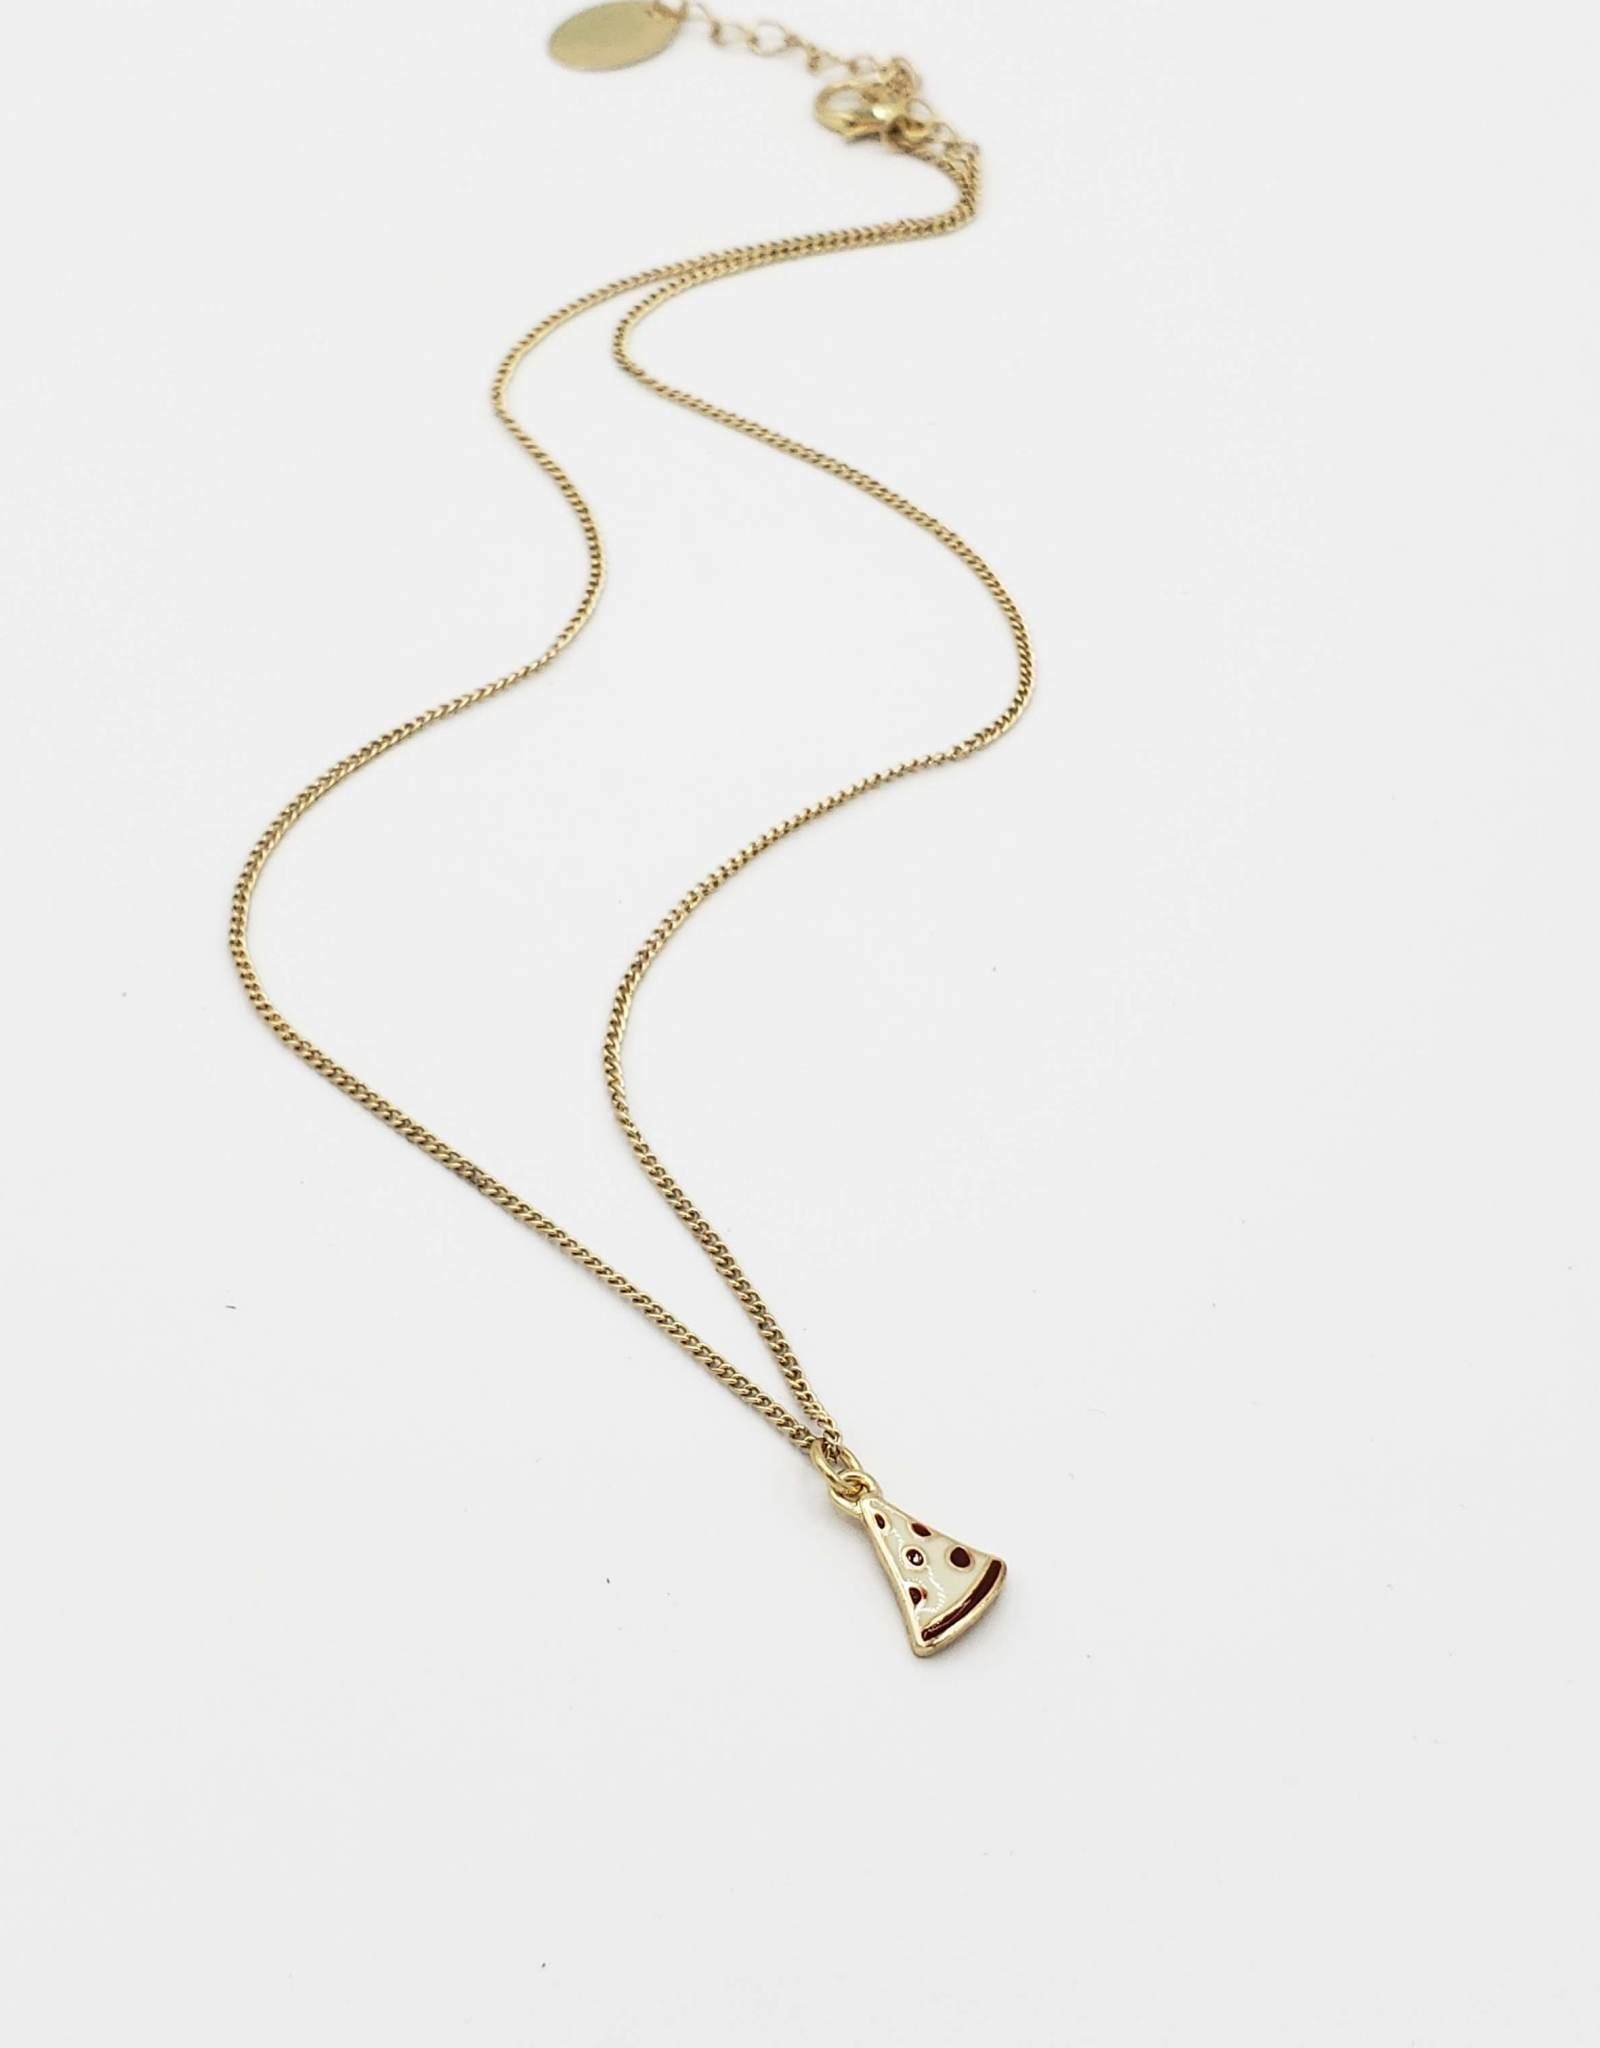 Gold Pizza Slice Necklace